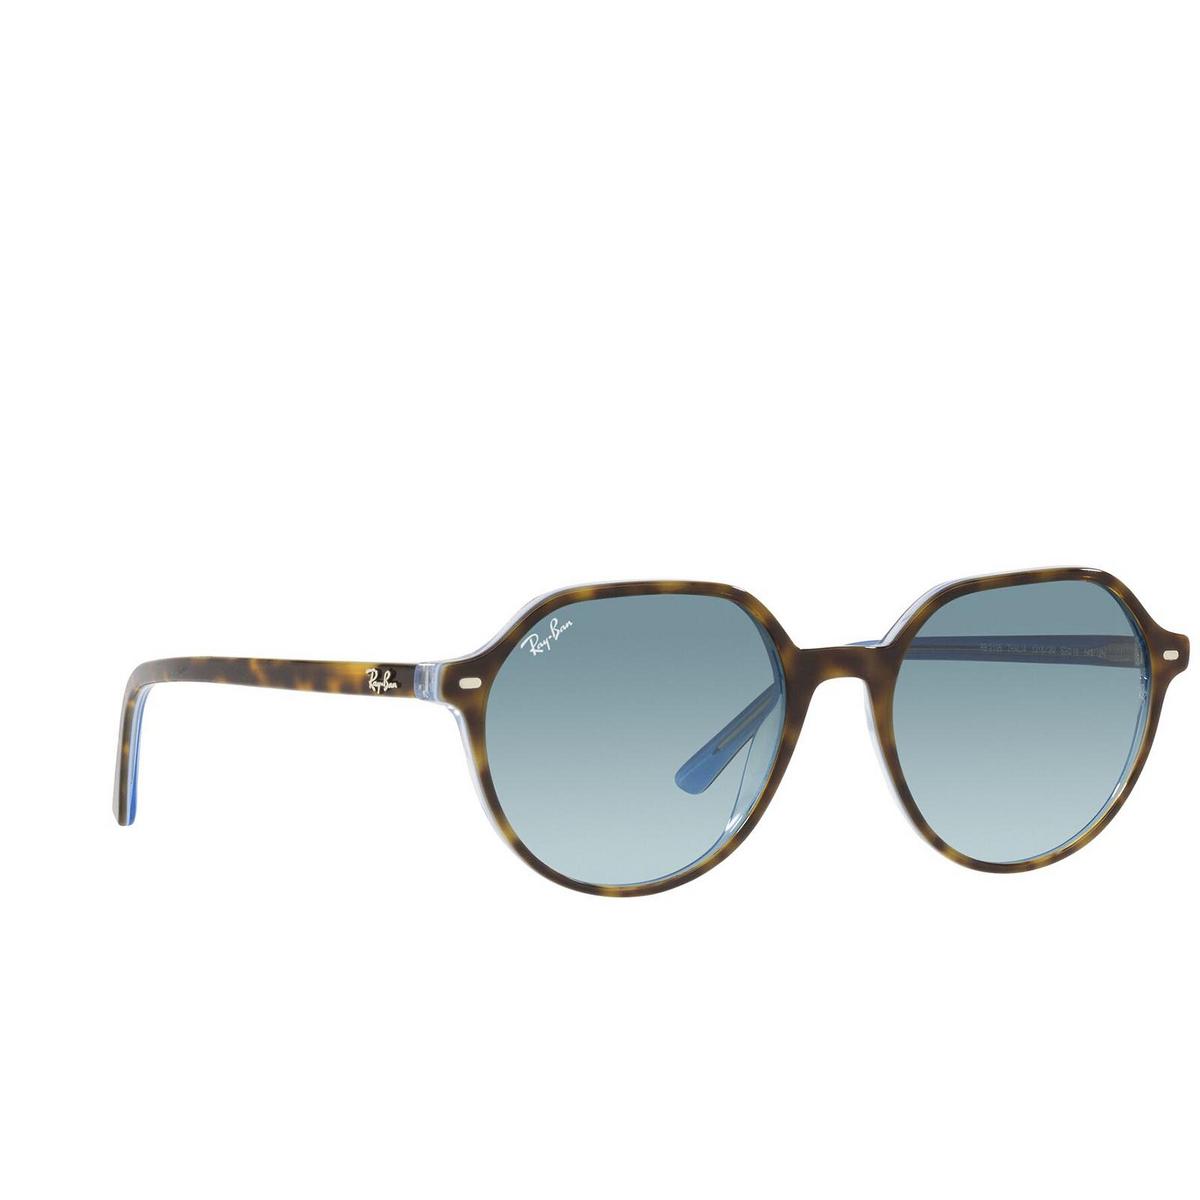 Ray-Ban® Irregular Sunglasses: Thalia RB2195 color Havana On Light Blue 13163M - 2/3.